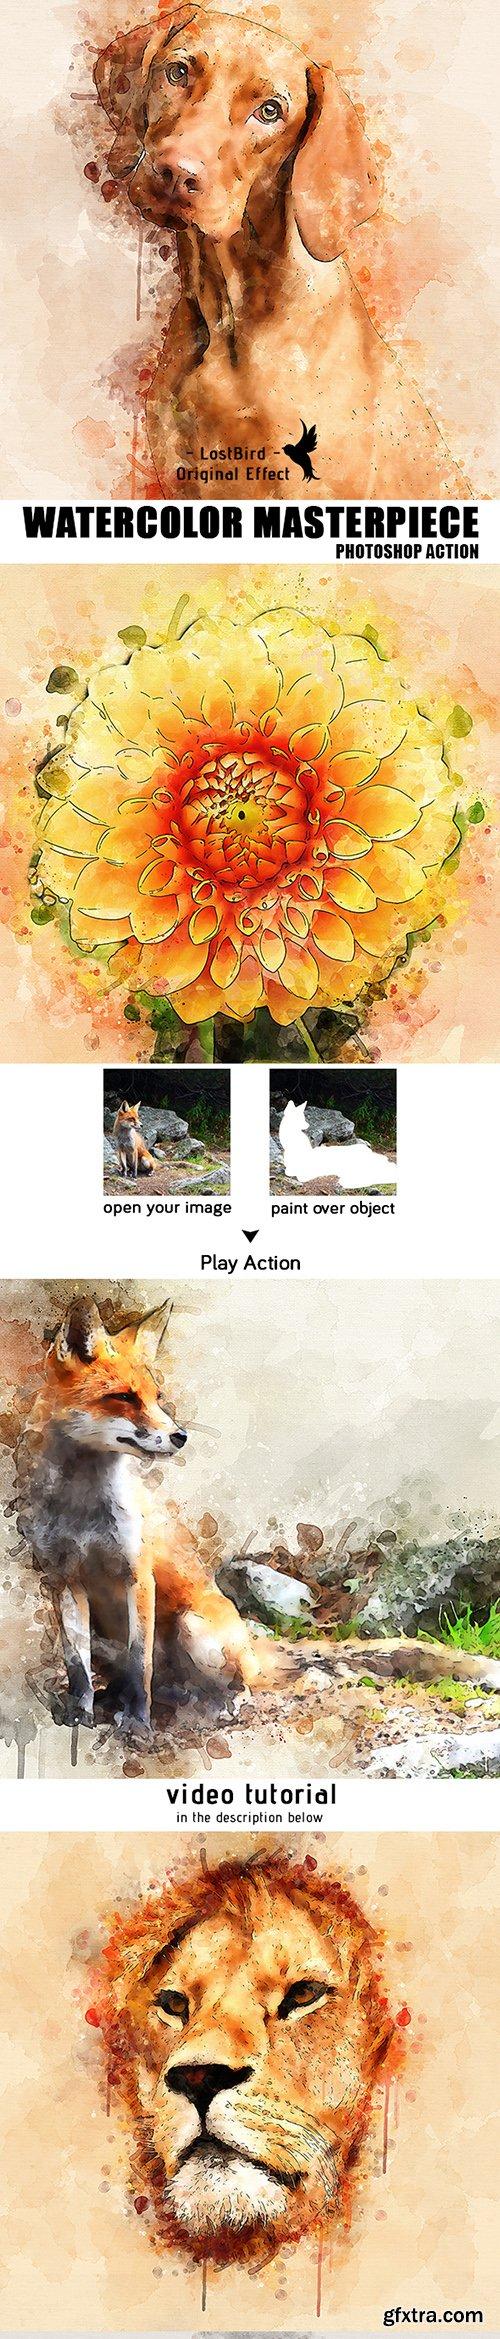 Graphicriver Watercolor Masterpiece - Photoshop Action 22921333